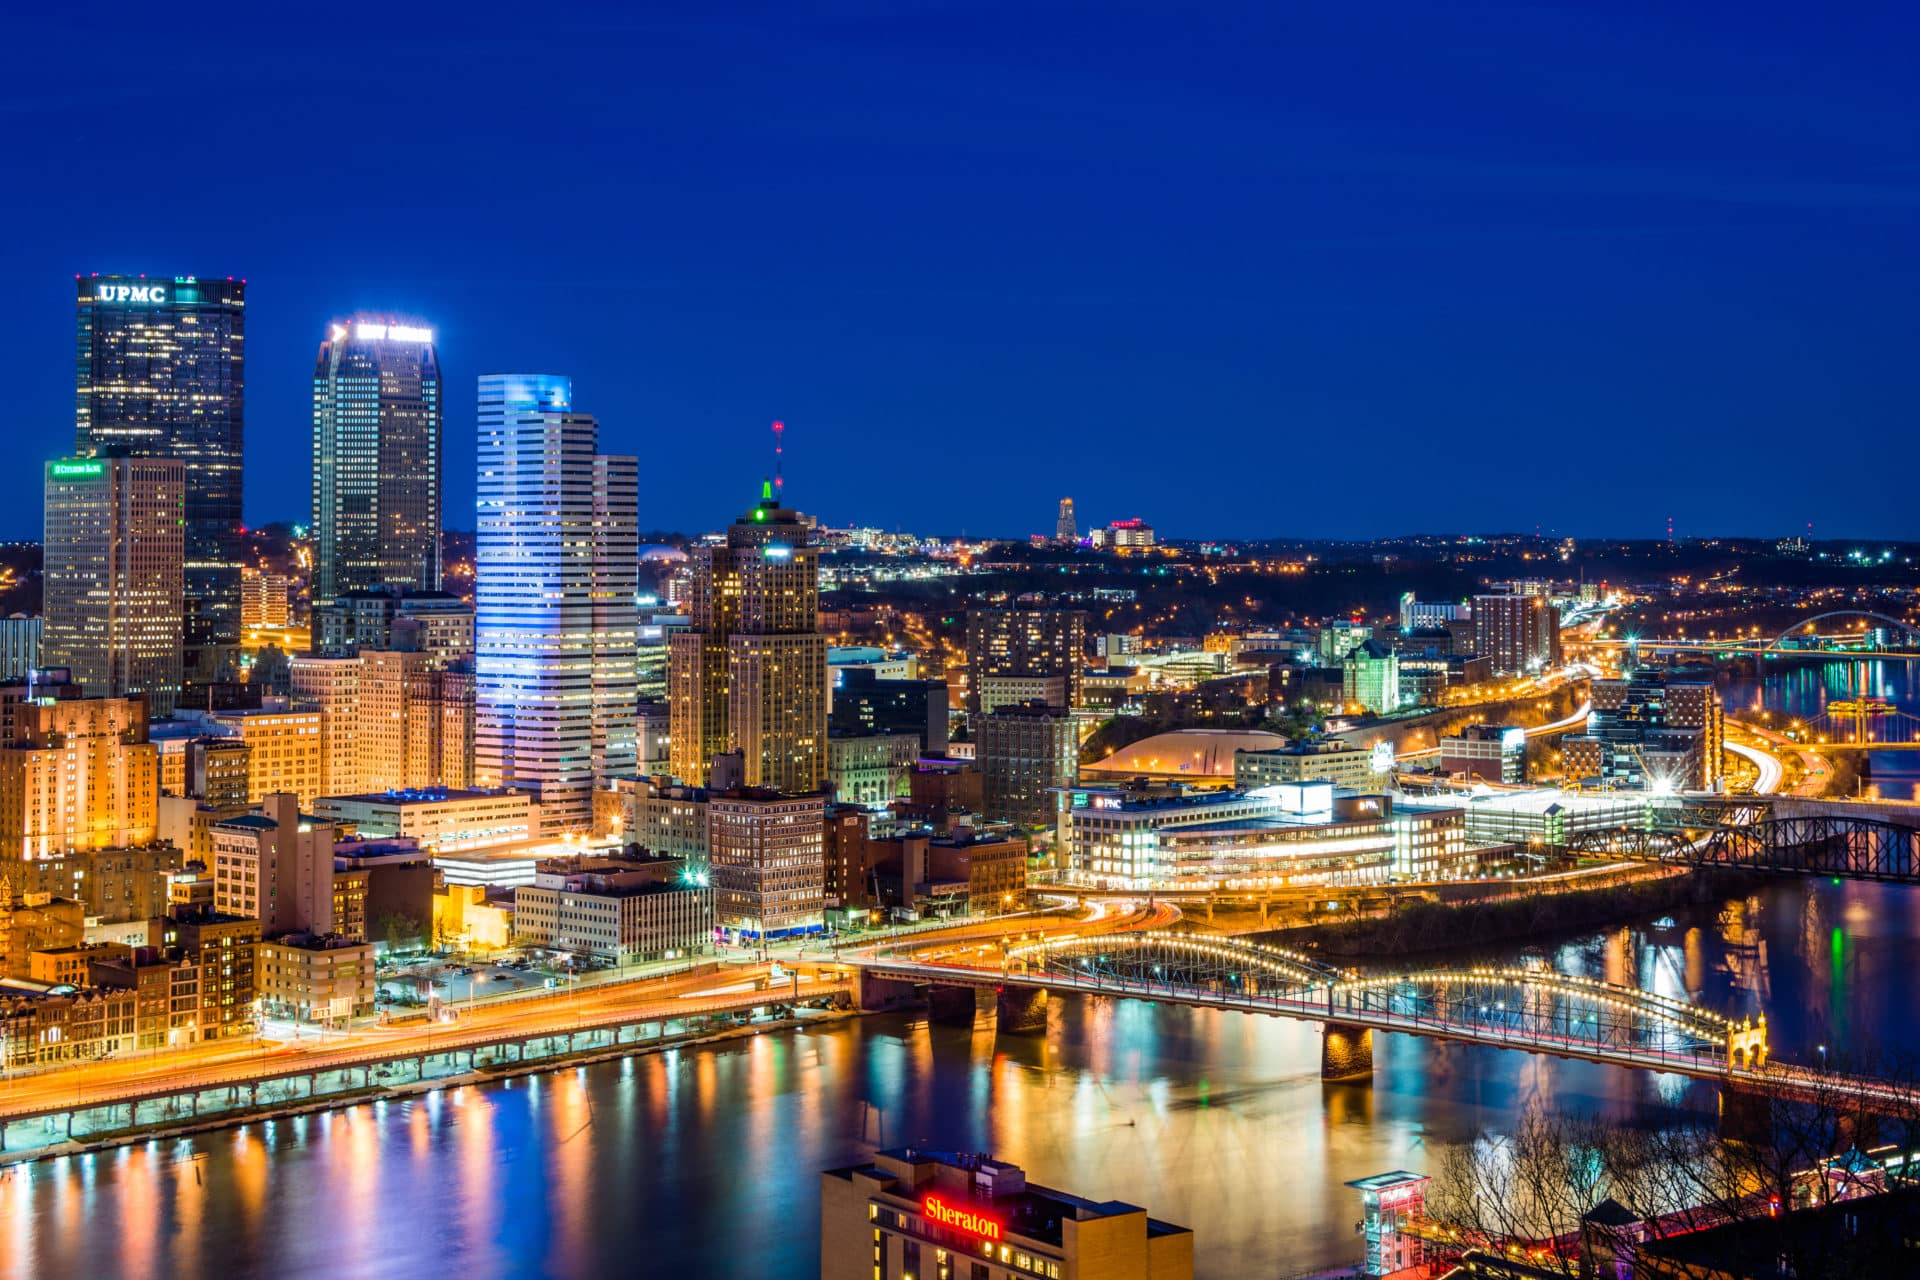 Pittsburgh, Pennsylvania; 50 Marketing